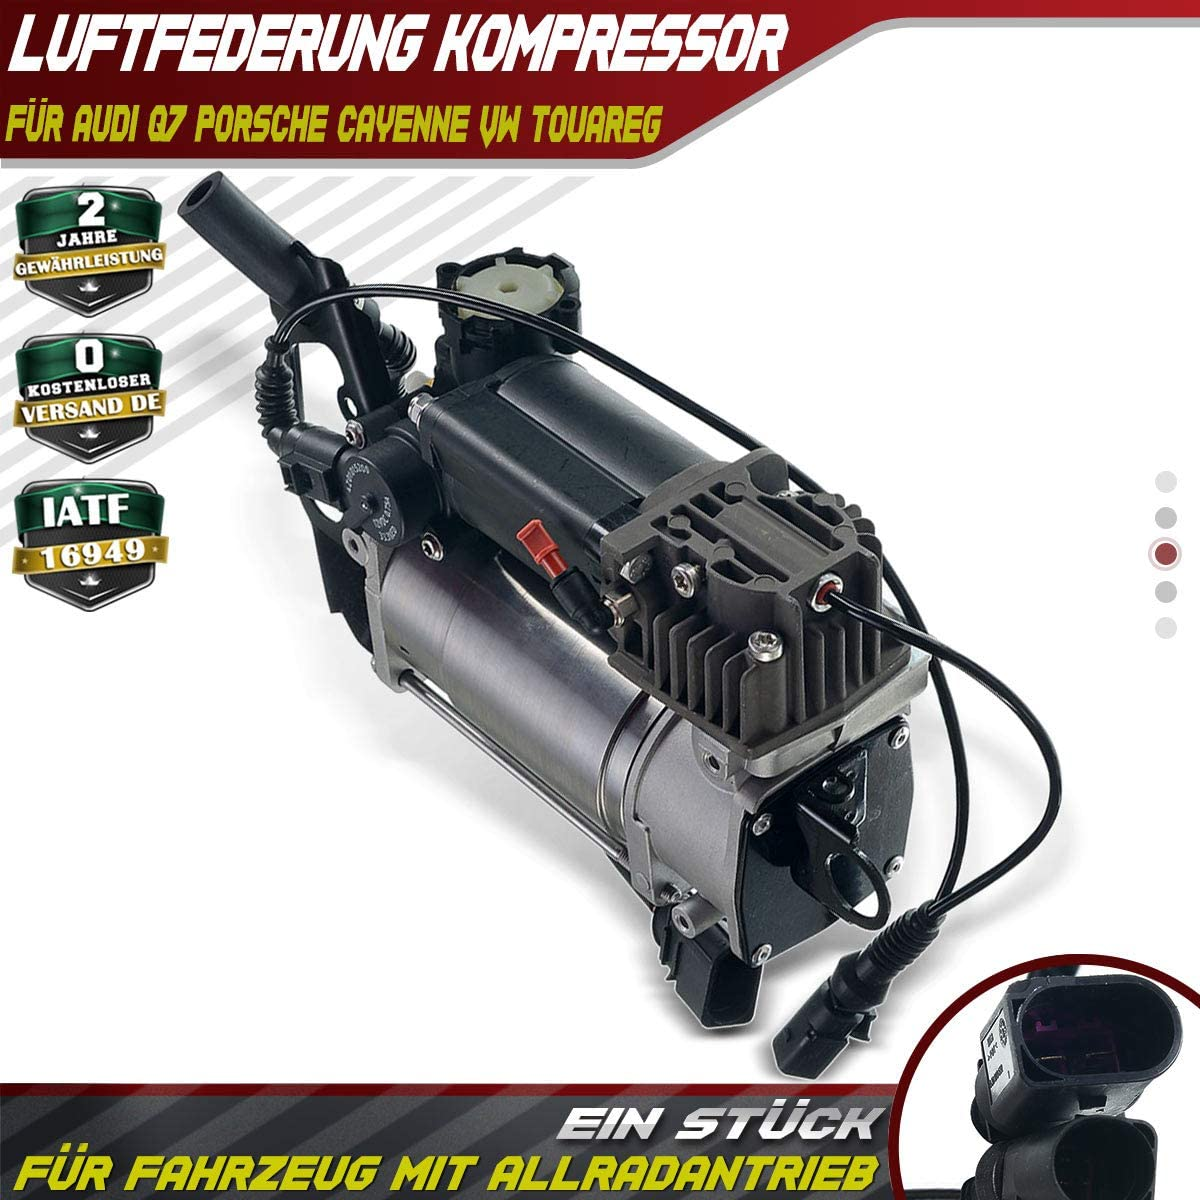 Compresseur dair pour Q7 4LB Cayenne 955 9PA Touareg 7LA 7L6 7L7 2000-2015 7L8616007F